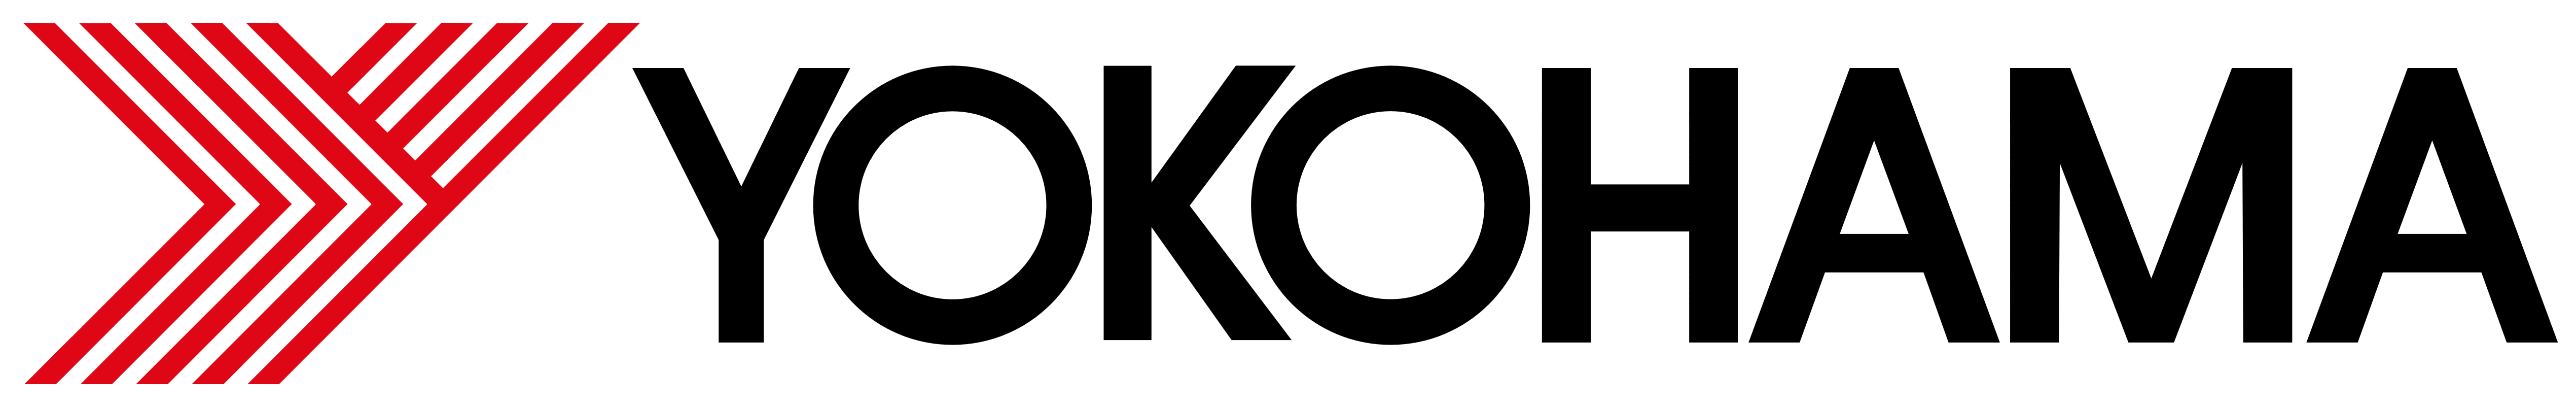 yokohama logos download Dream Real Estate Clip Art Real Estate Symbols Clip Art